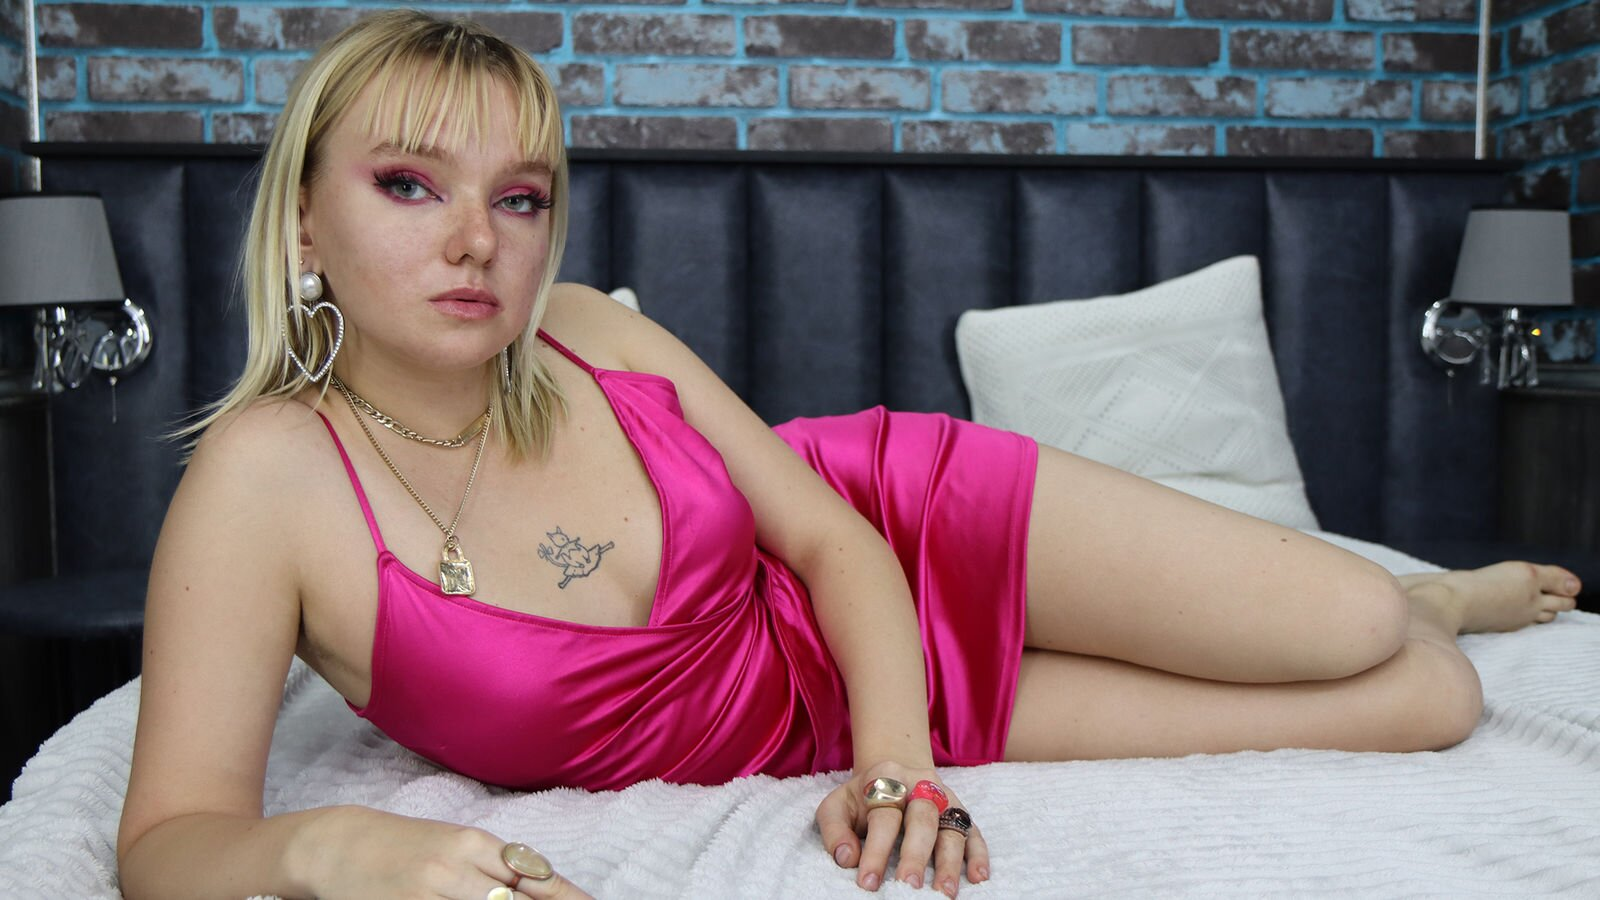 RosalinaPalmer